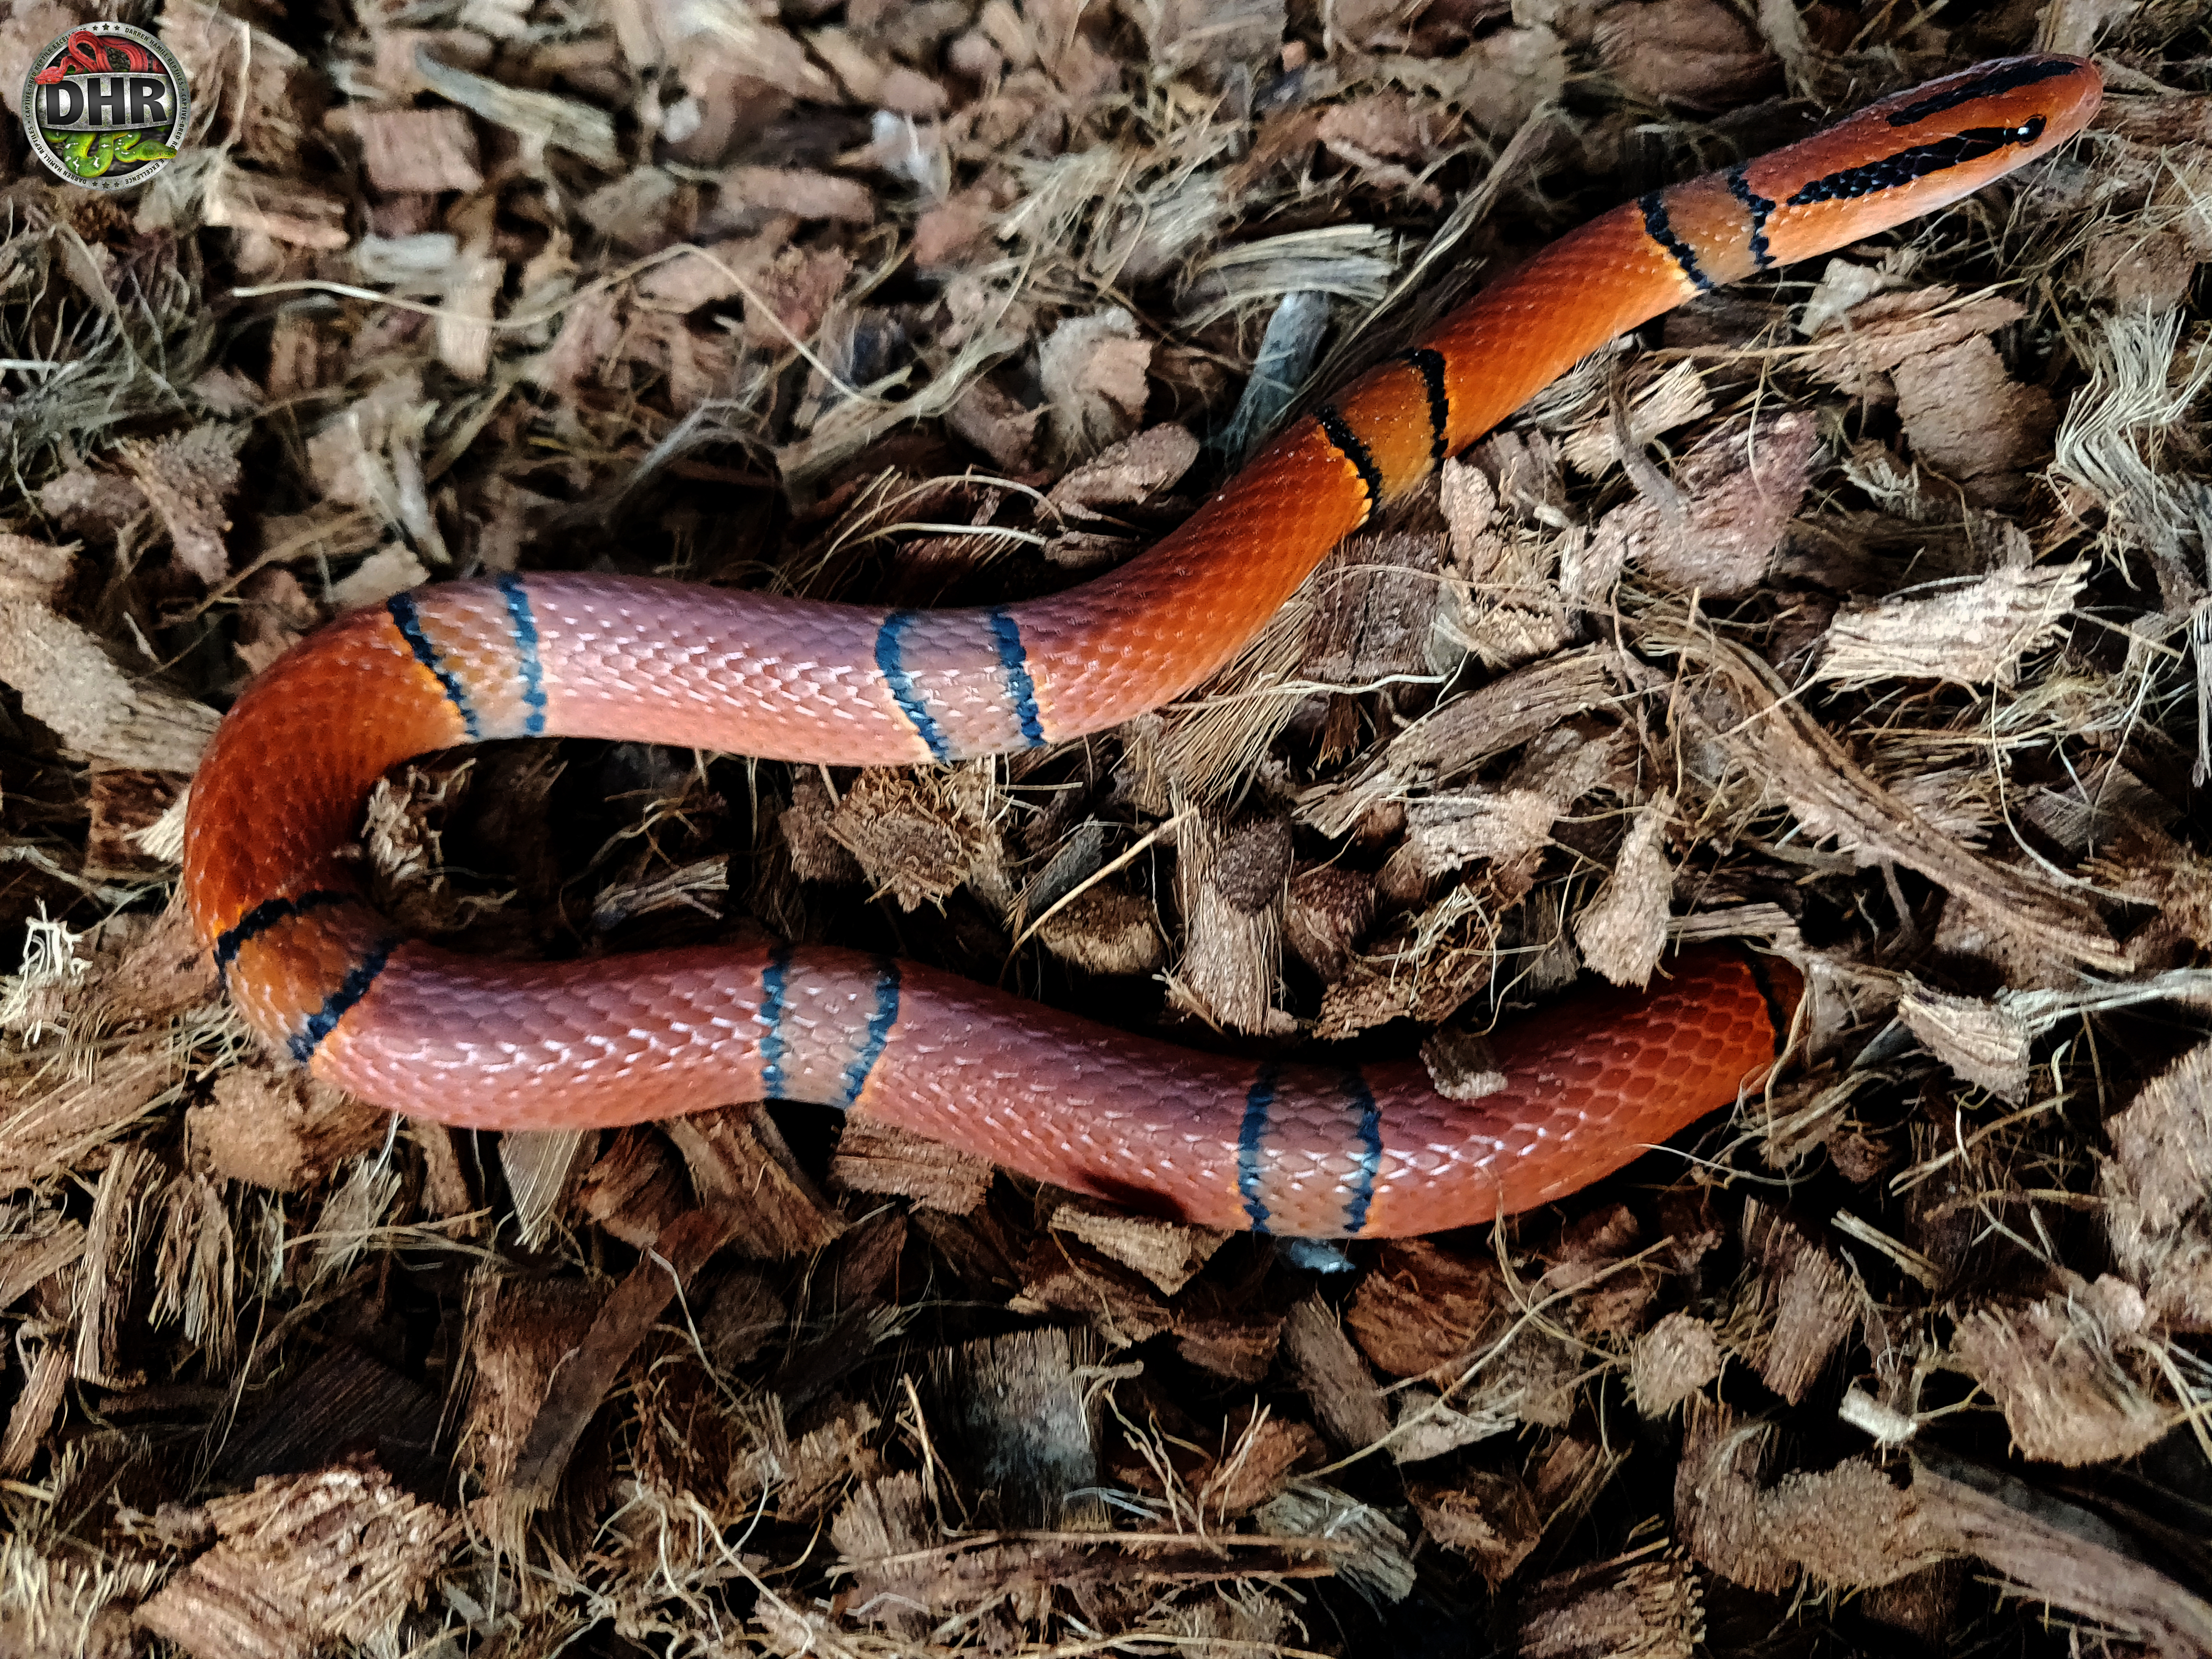 Yunnan Mountain Rat Snake Pics